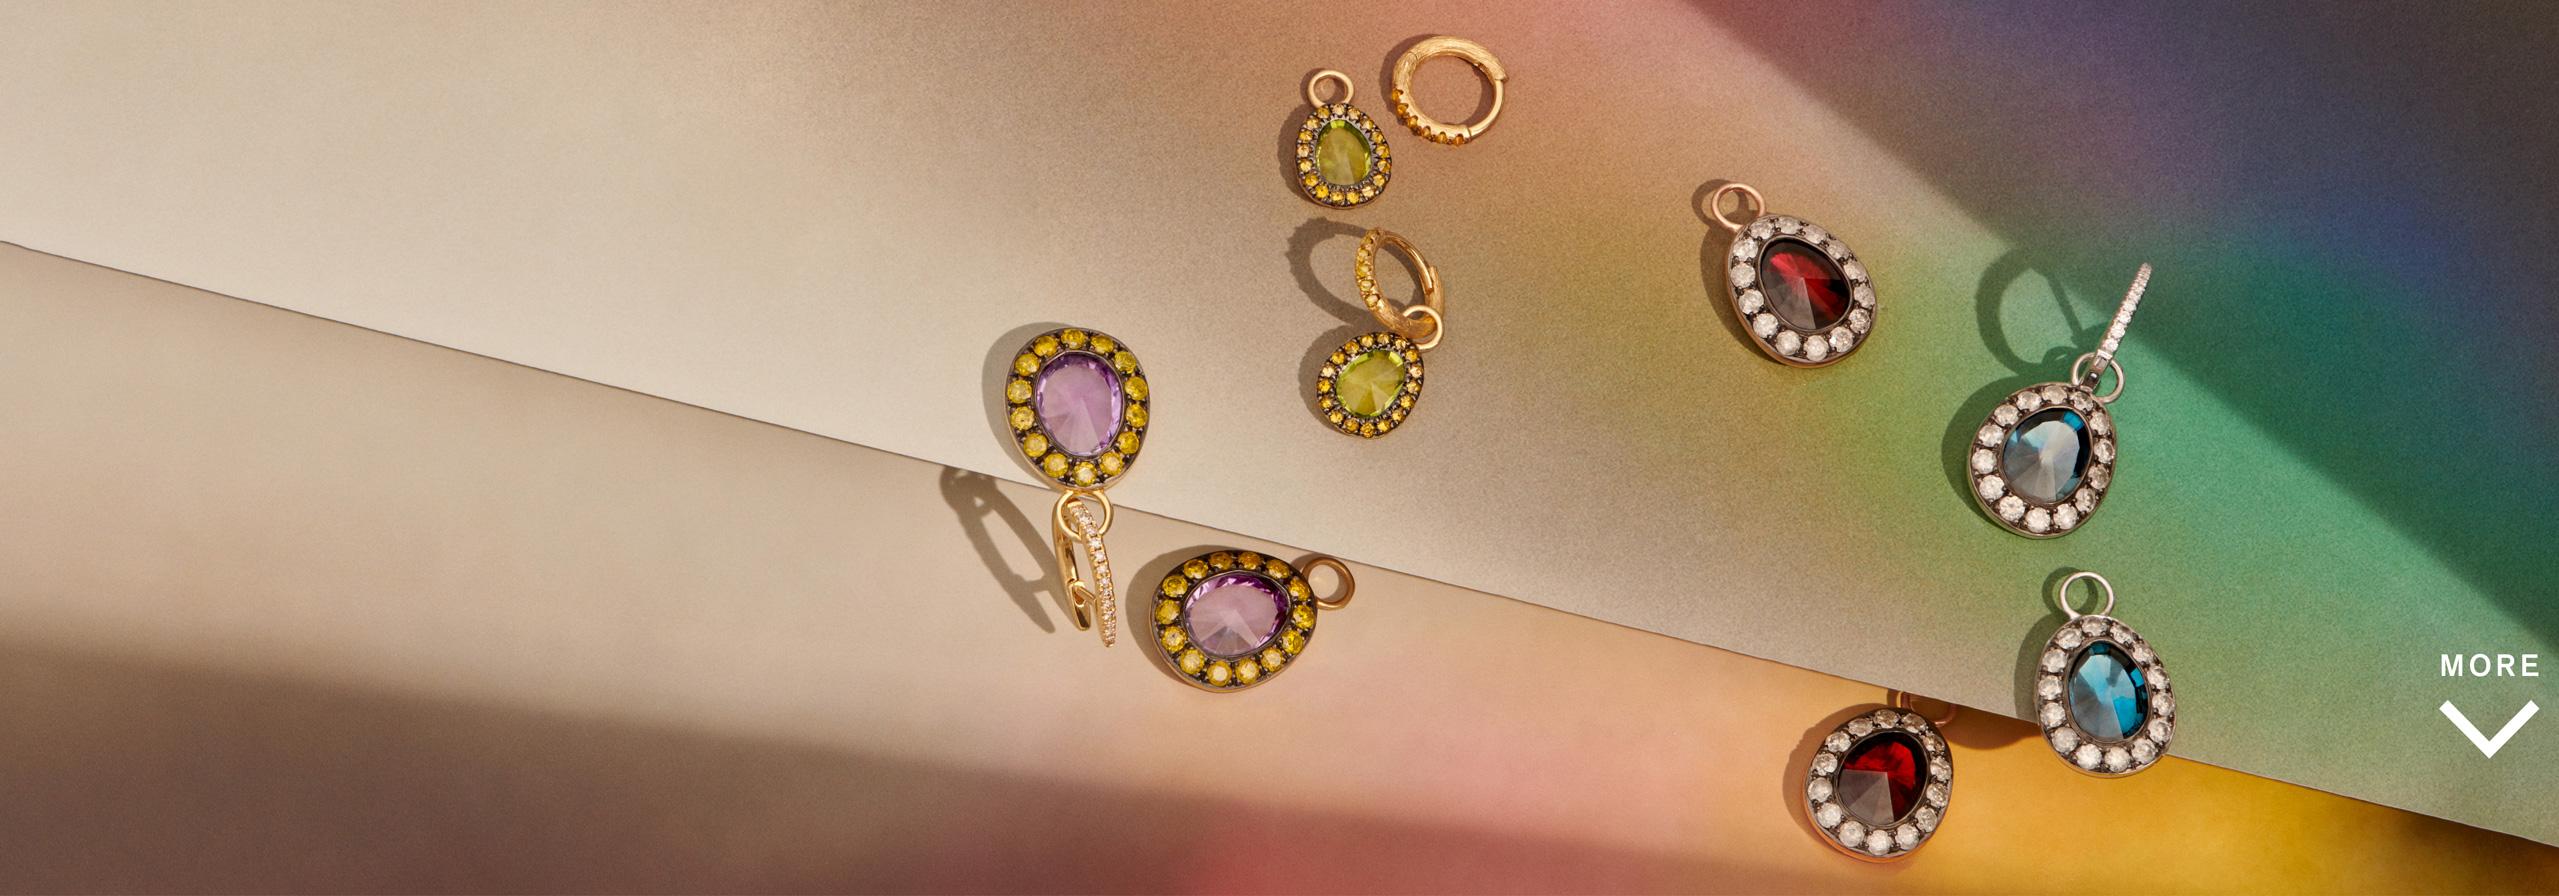 Annoushka Dusty Diamonds collection